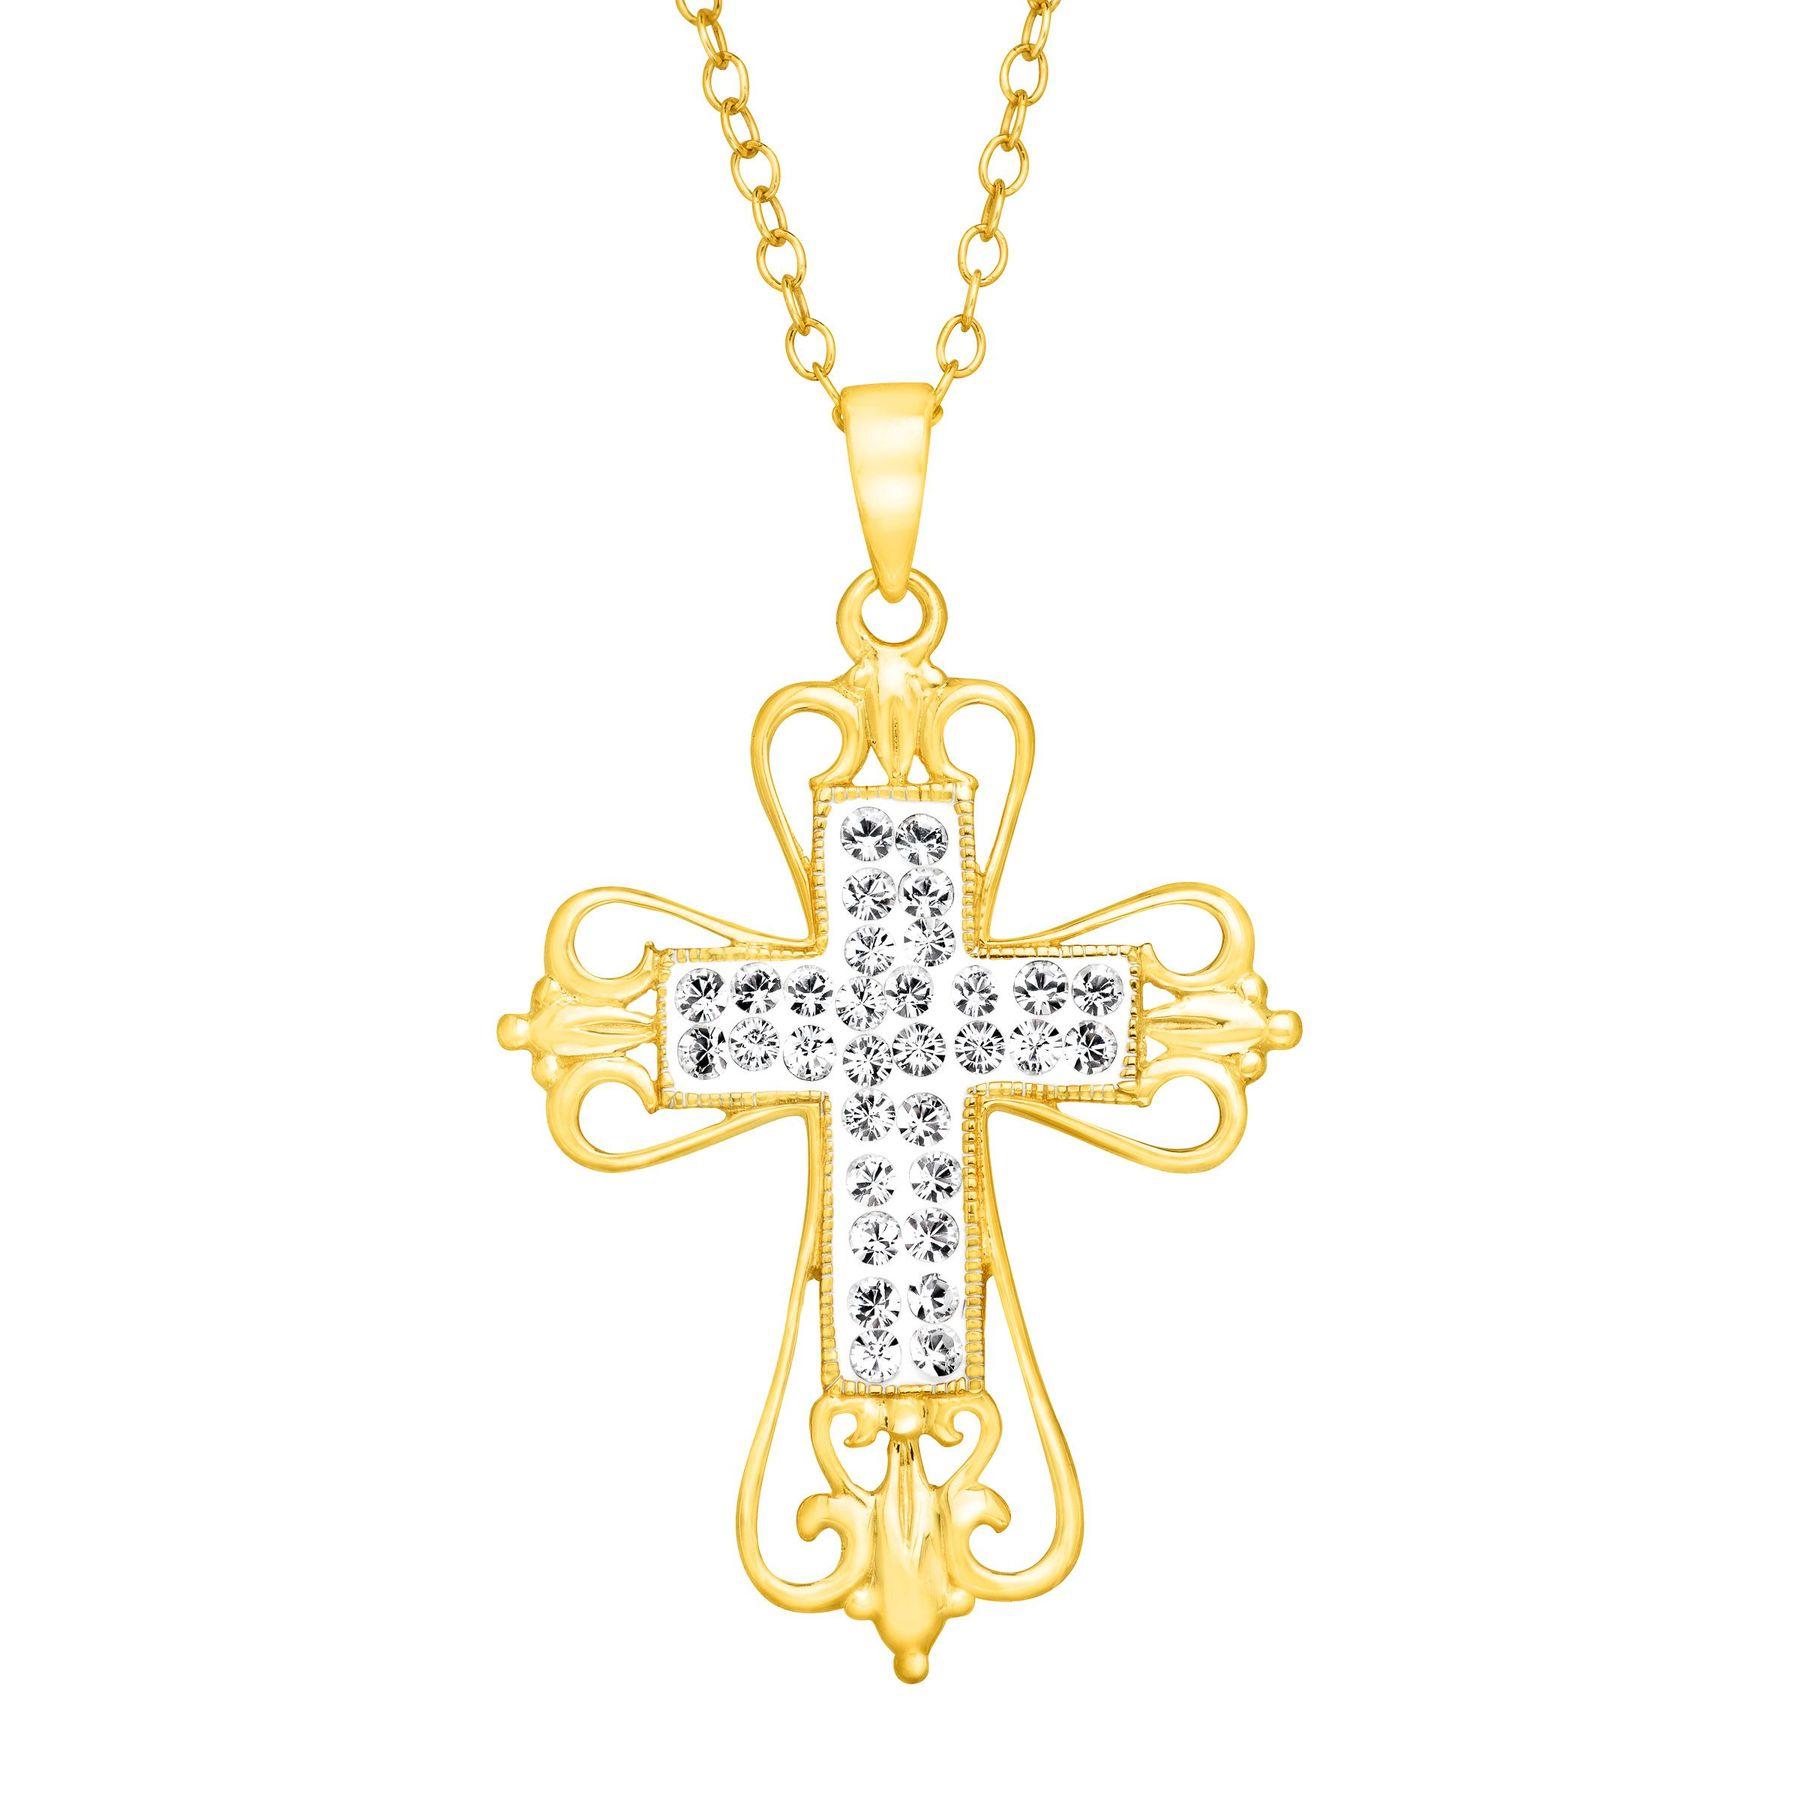 Crystaluxe open swirl cross pendant with swarovski in 18k gold open swirl cross pendant with swarovski crystals aloadofball Choice Image